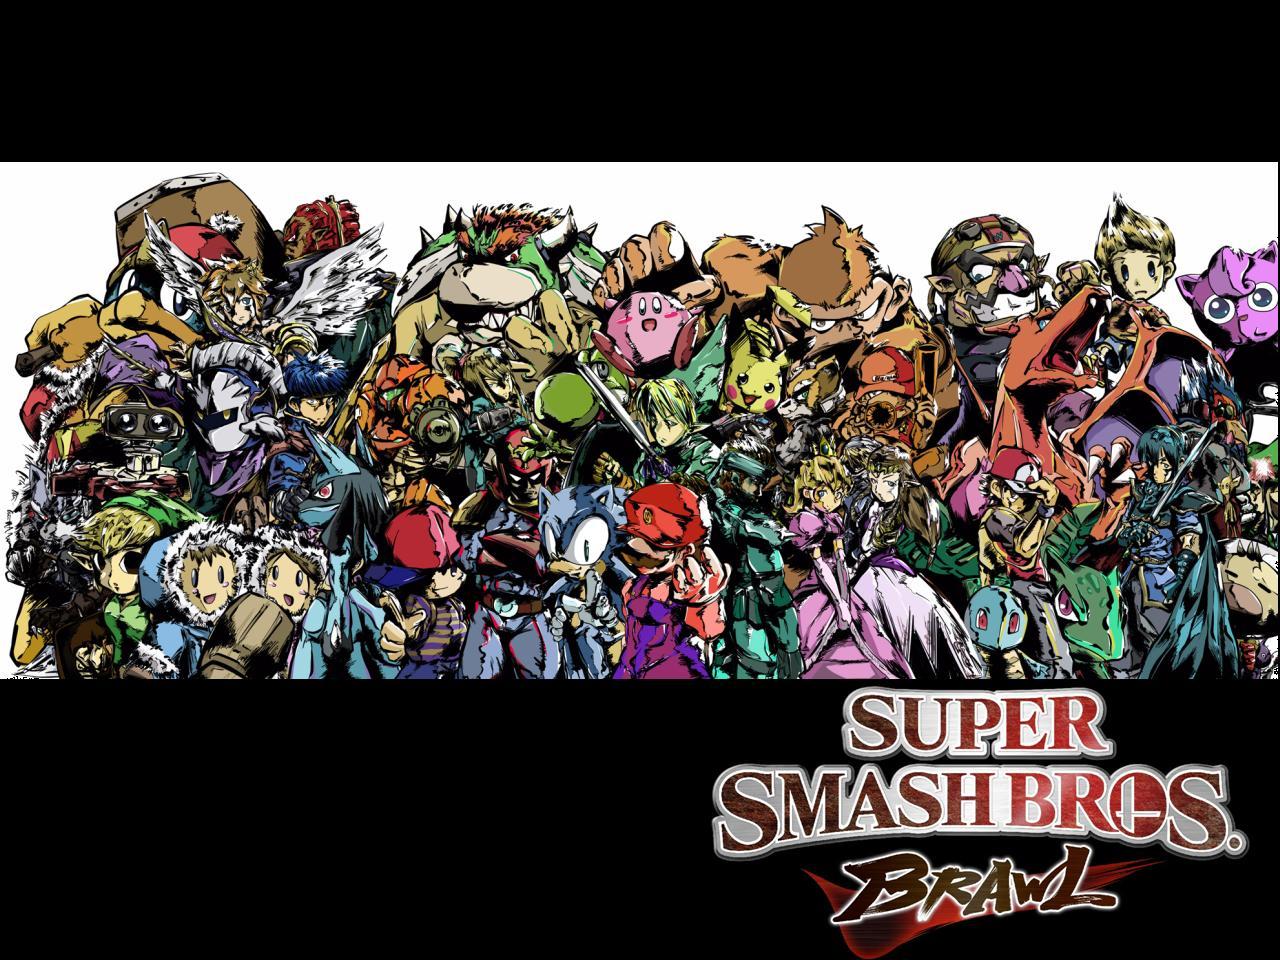 Free Download Top Smash Bros Iphone Wallpapers Wallpapers